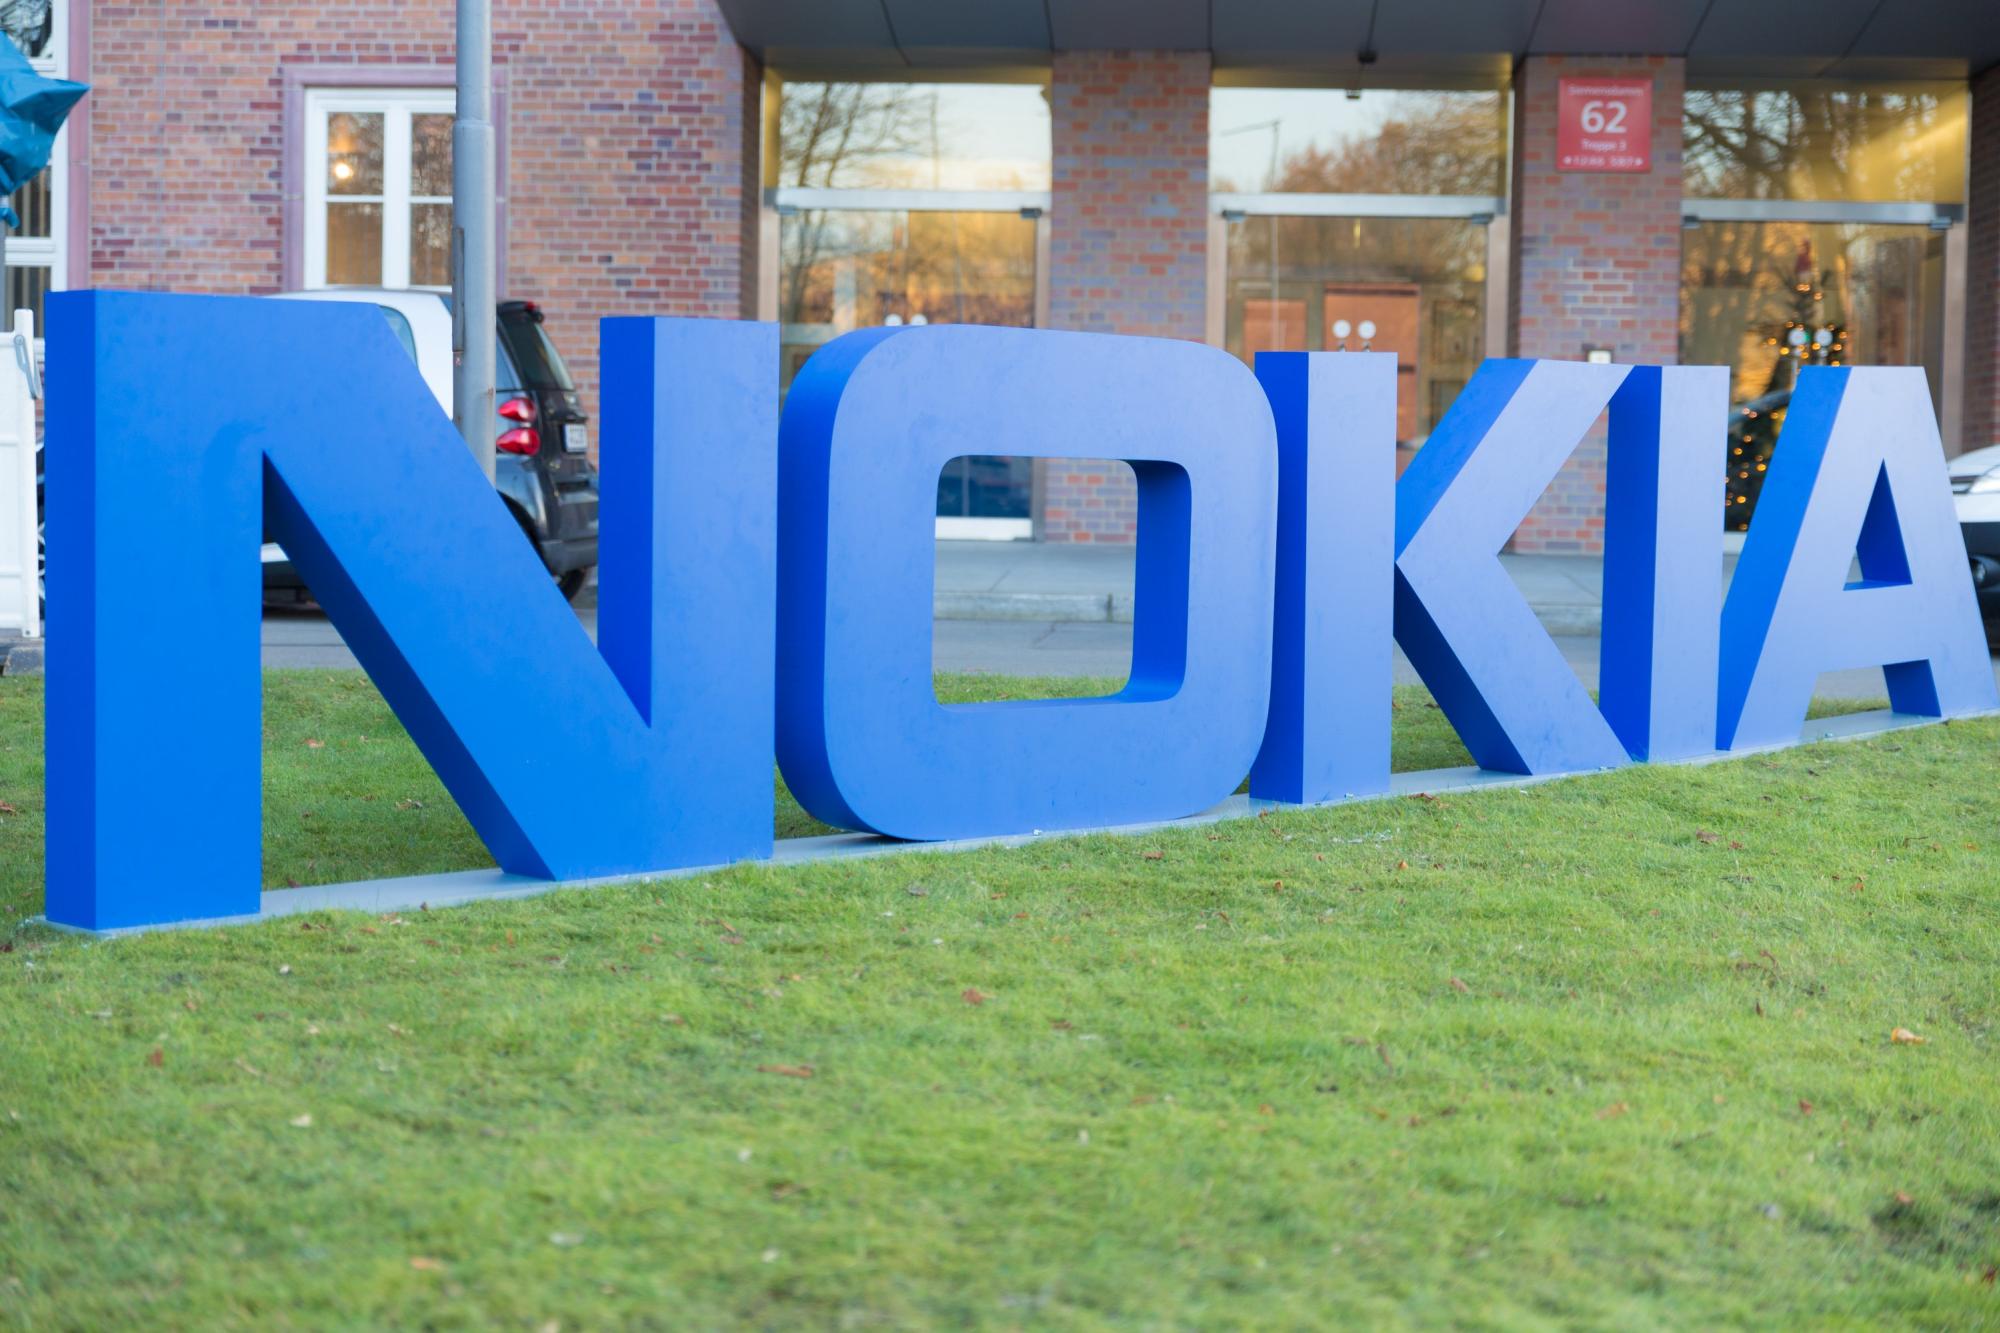 Nokia 3, Nokia 5, Nokia 6, Nokia 8 confirmed for Android Pie update title